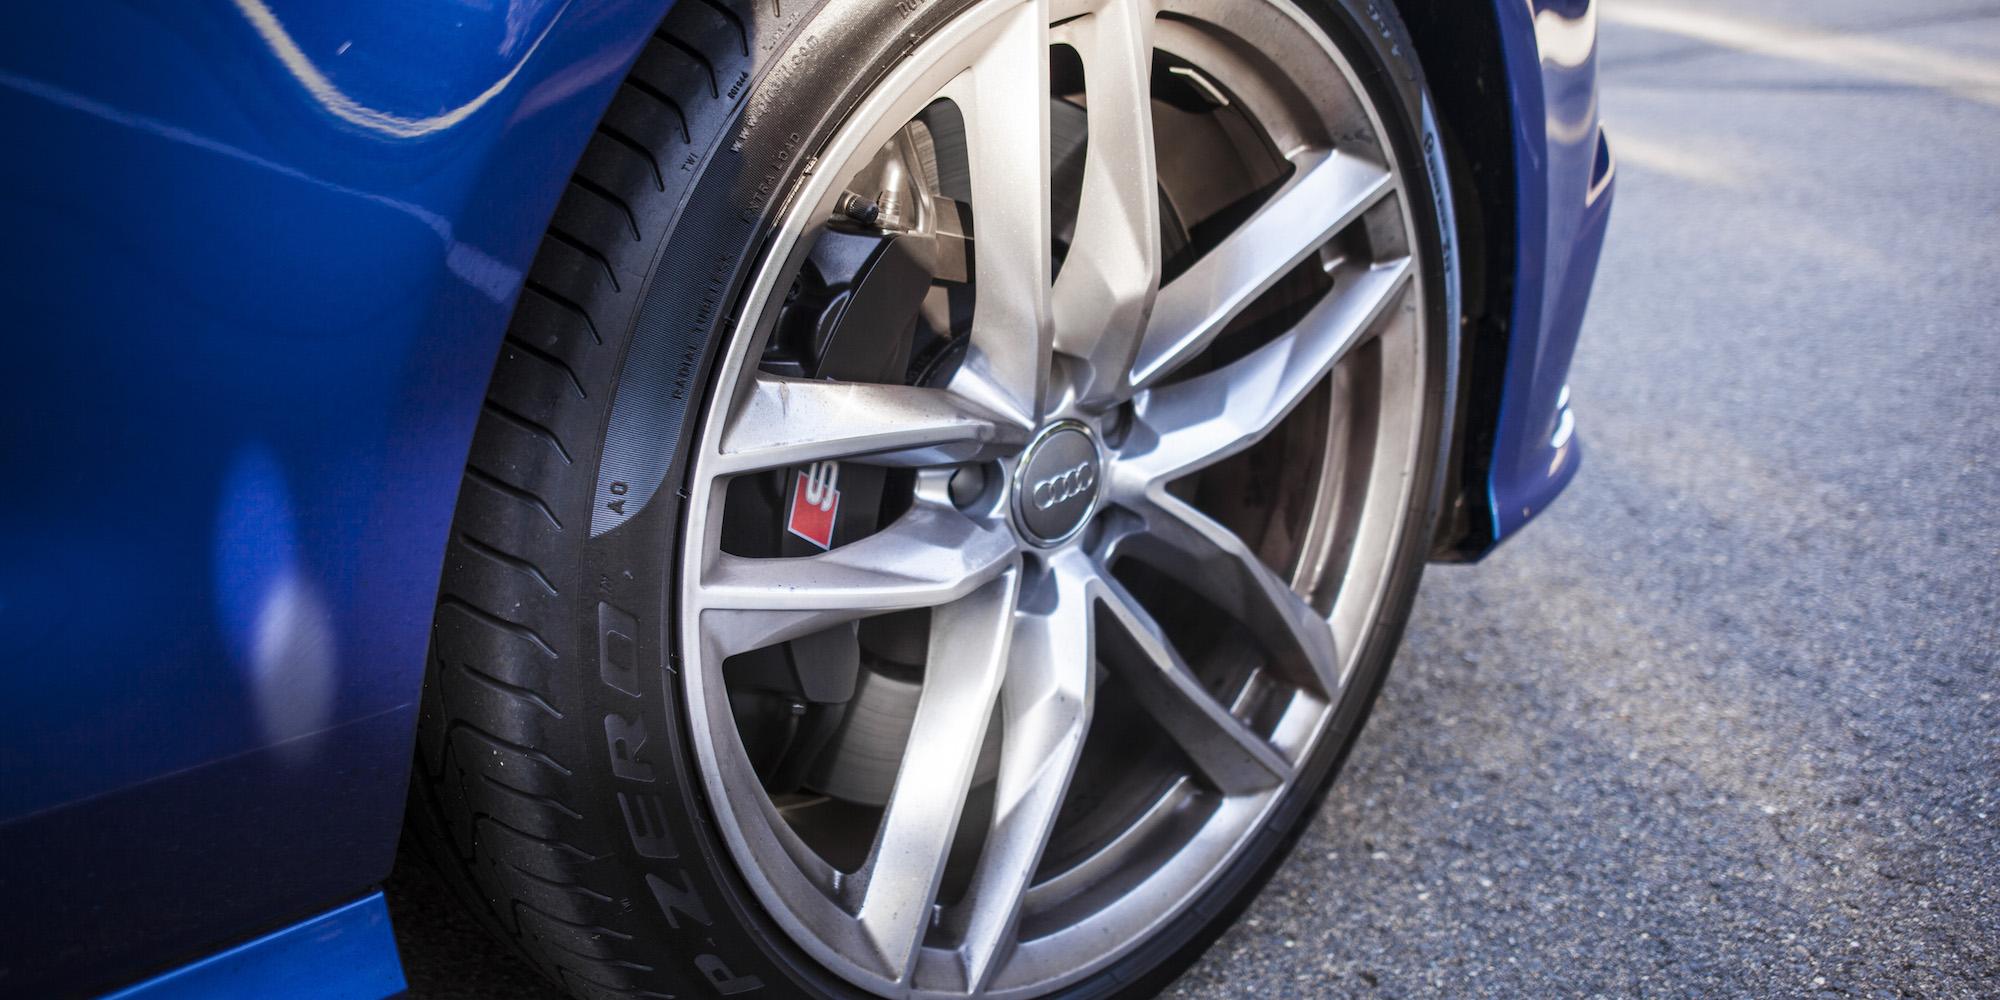 2016 Audi S7 Wheel